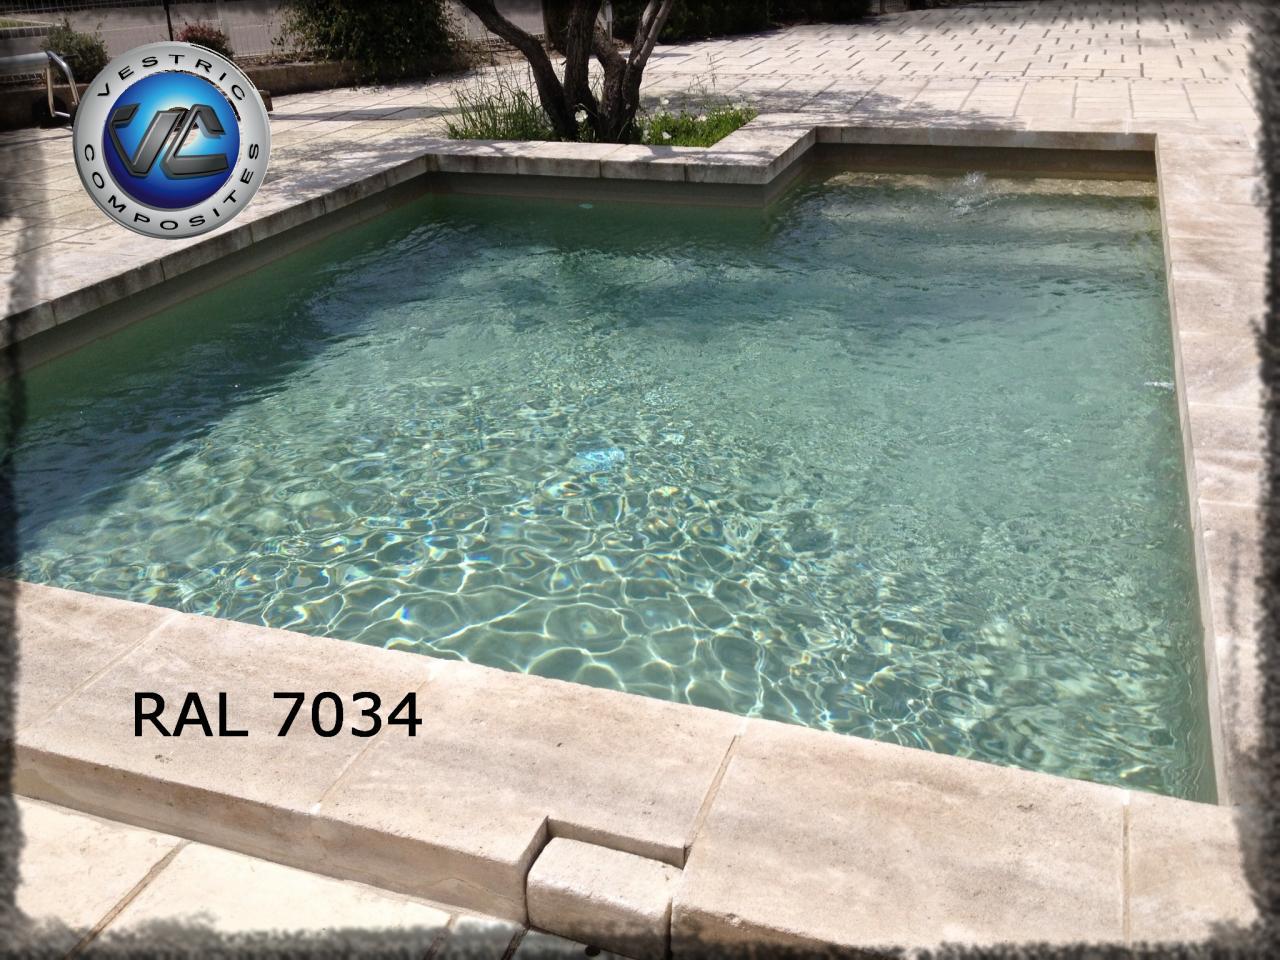 Design piscine gris bleu montreuil 3639 piscine for Piscine montreuil